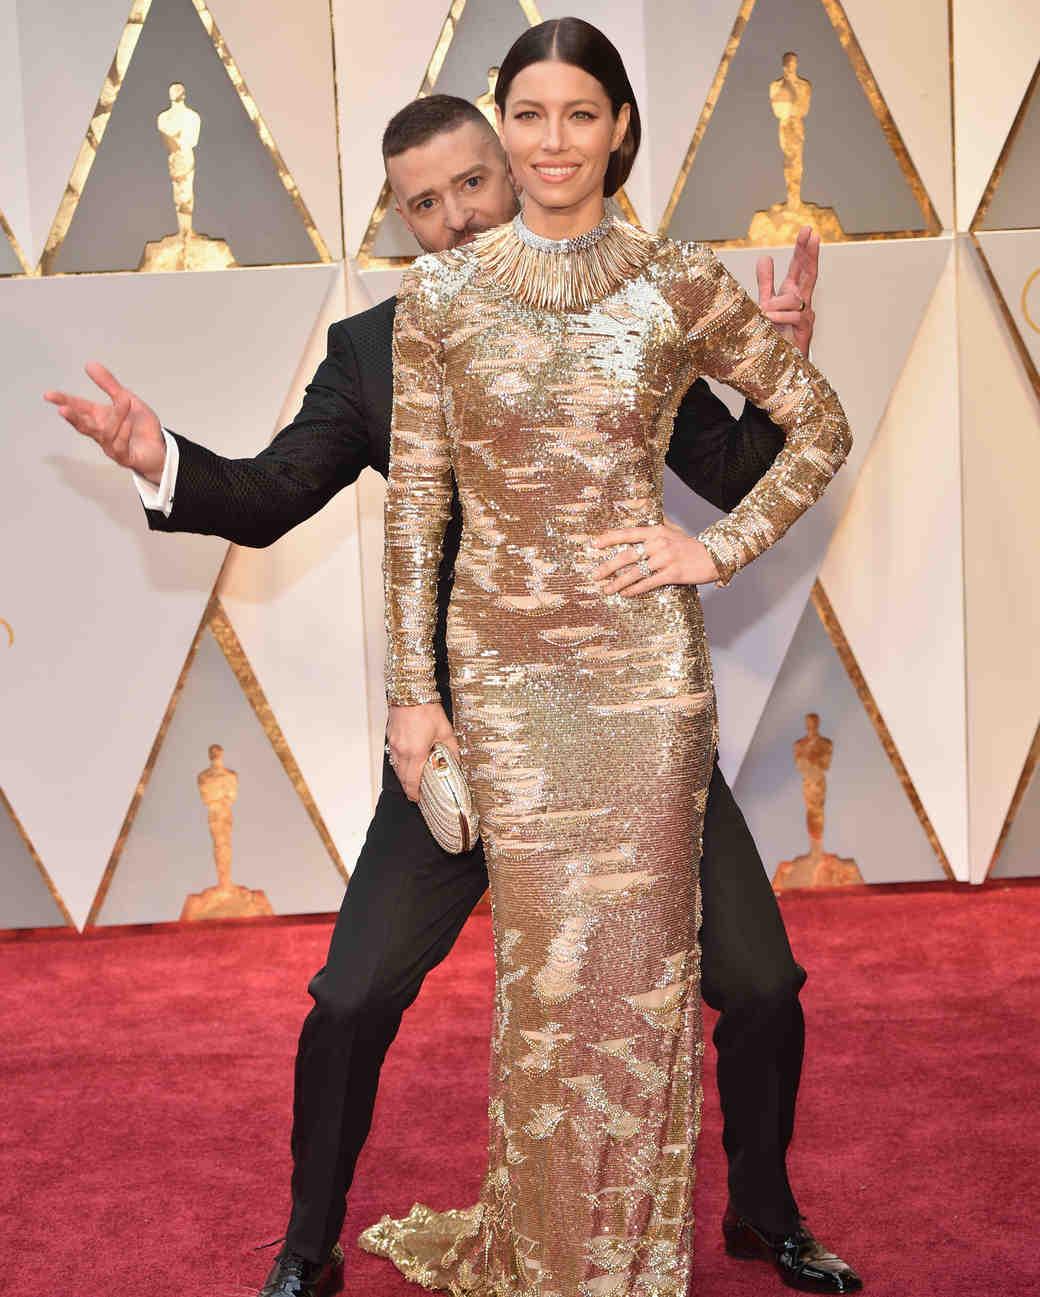 Justin Timberlake and Jessica Biel at 2017 Academy Awards